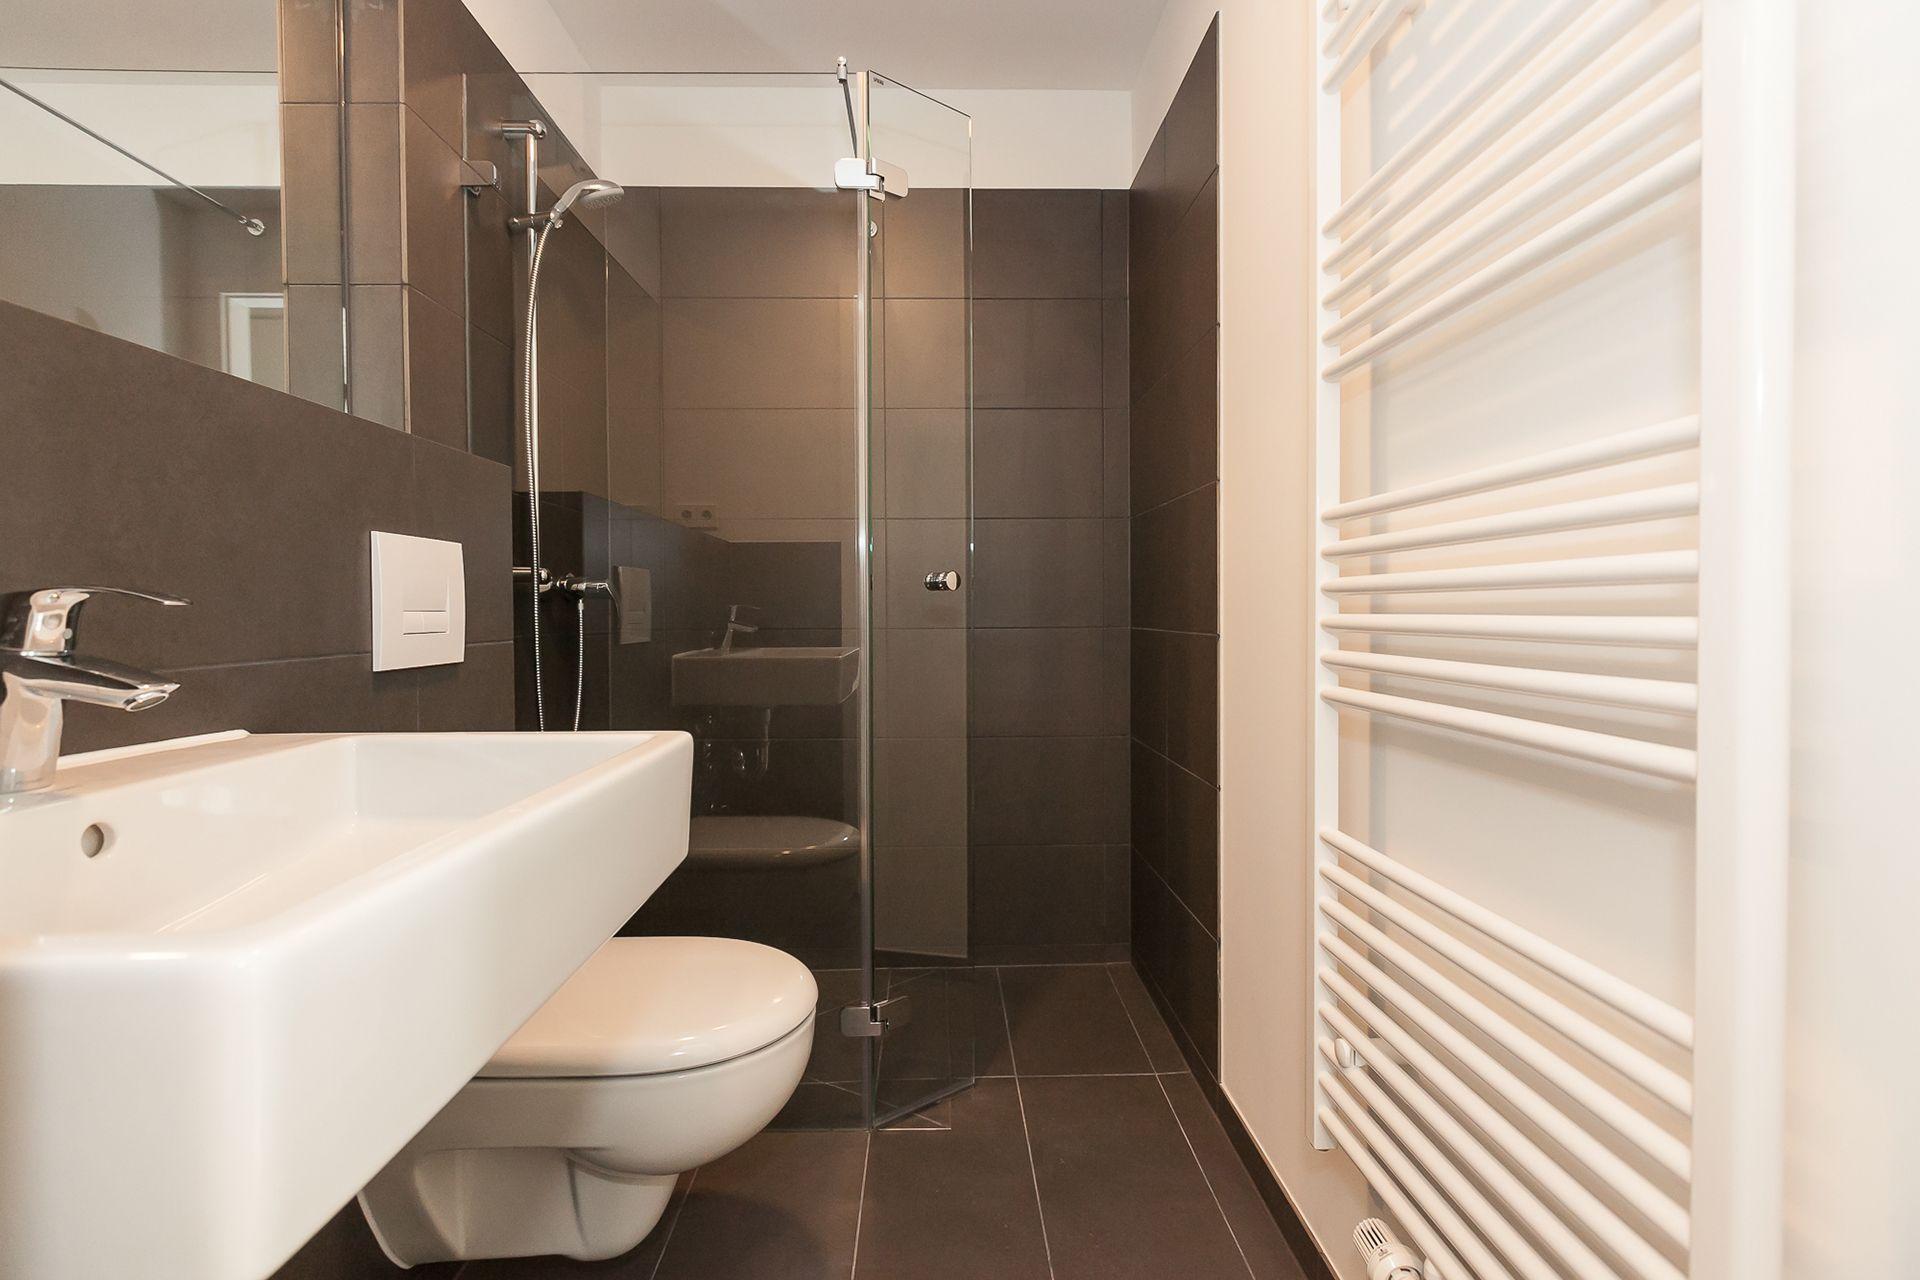 1 Bedroom - Small apartment to rent in Berlin KOEP-KOEP-0103-0